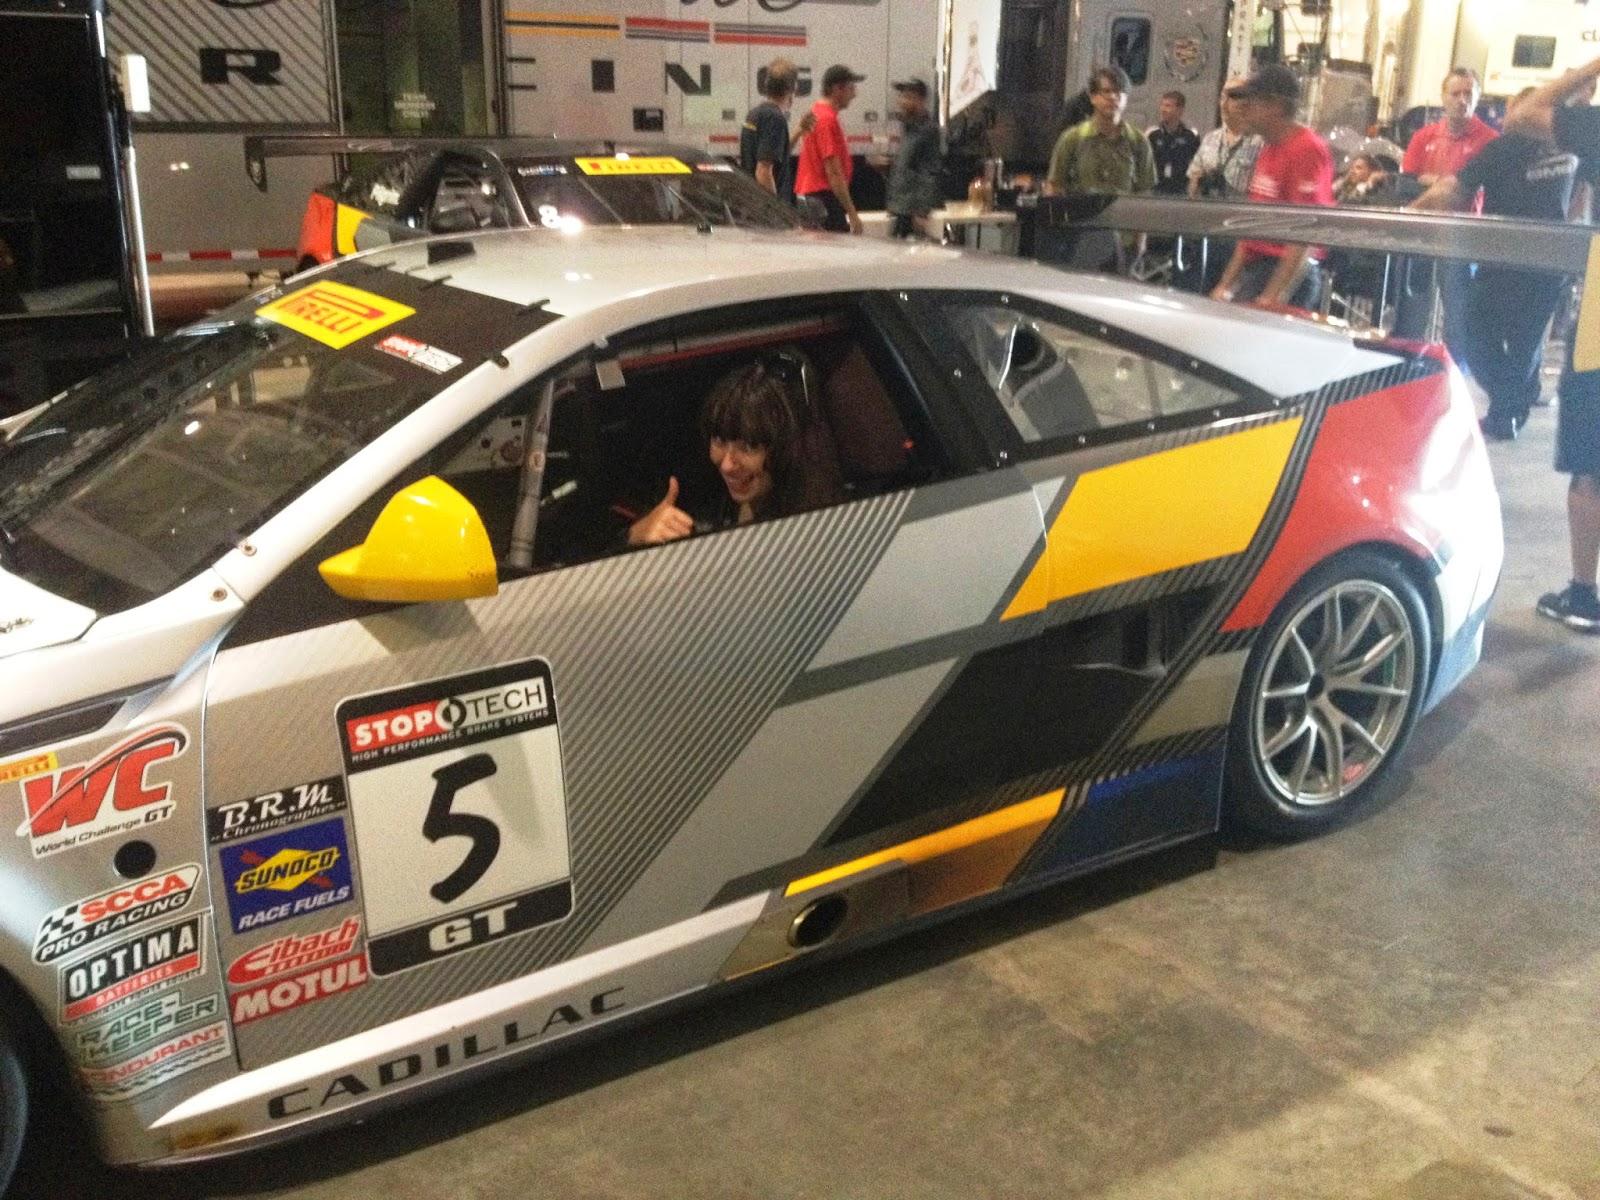 The Cadillac Racing Team Car